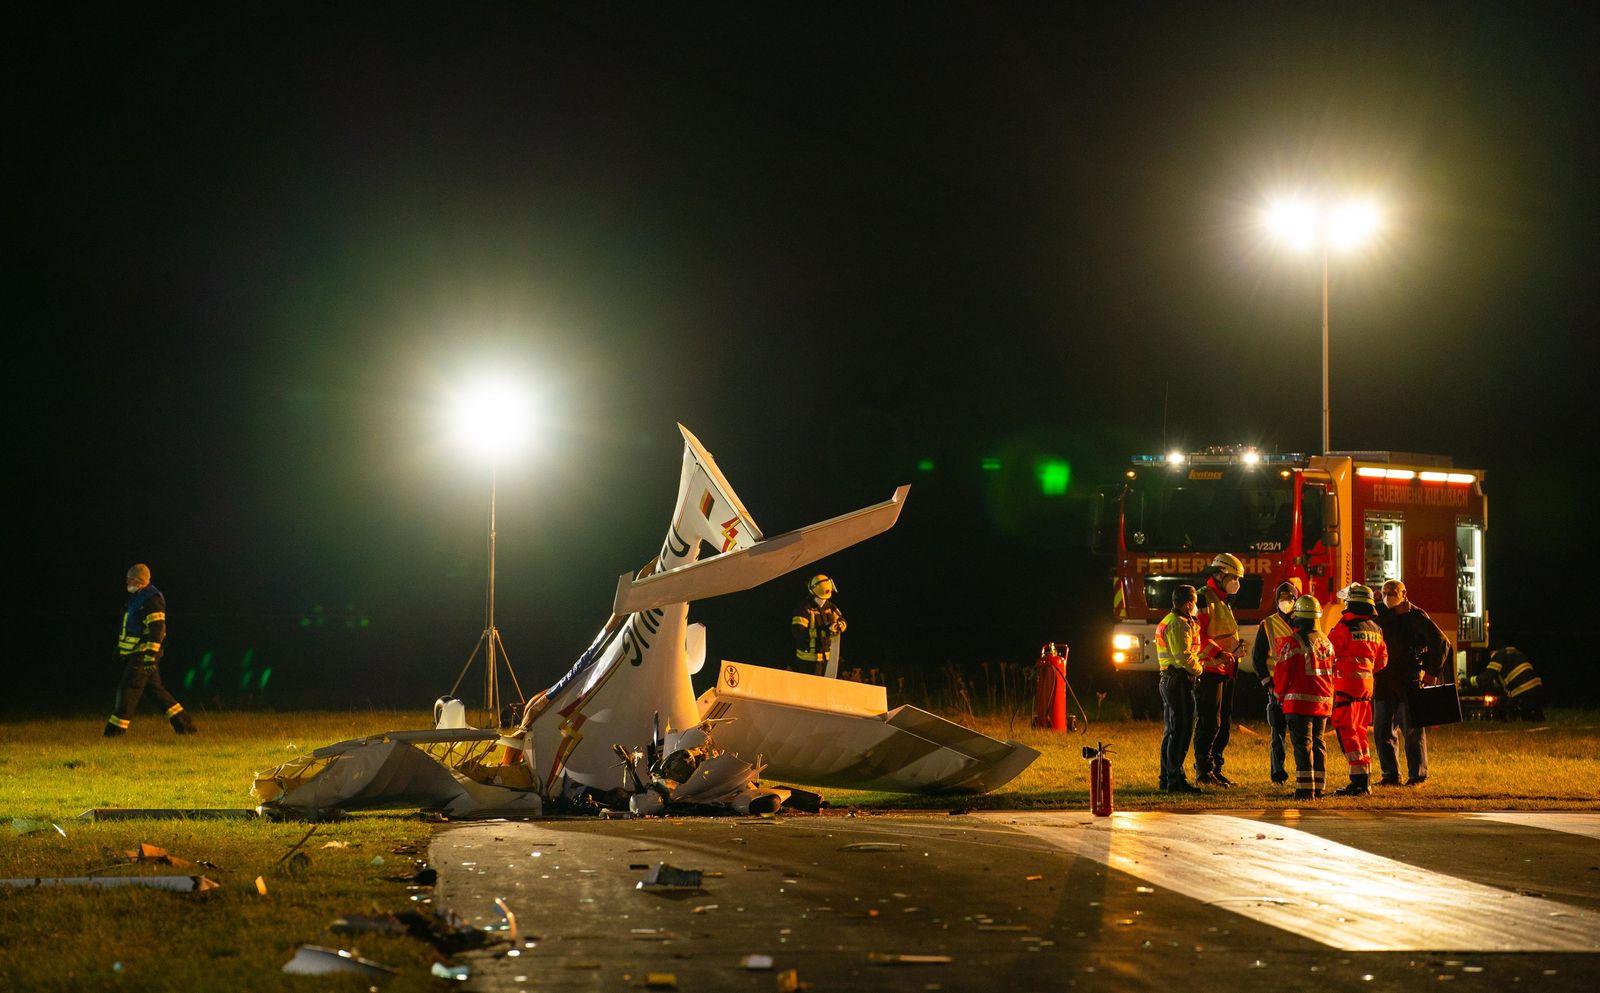 Flugzeugabsturz in Oberfranken